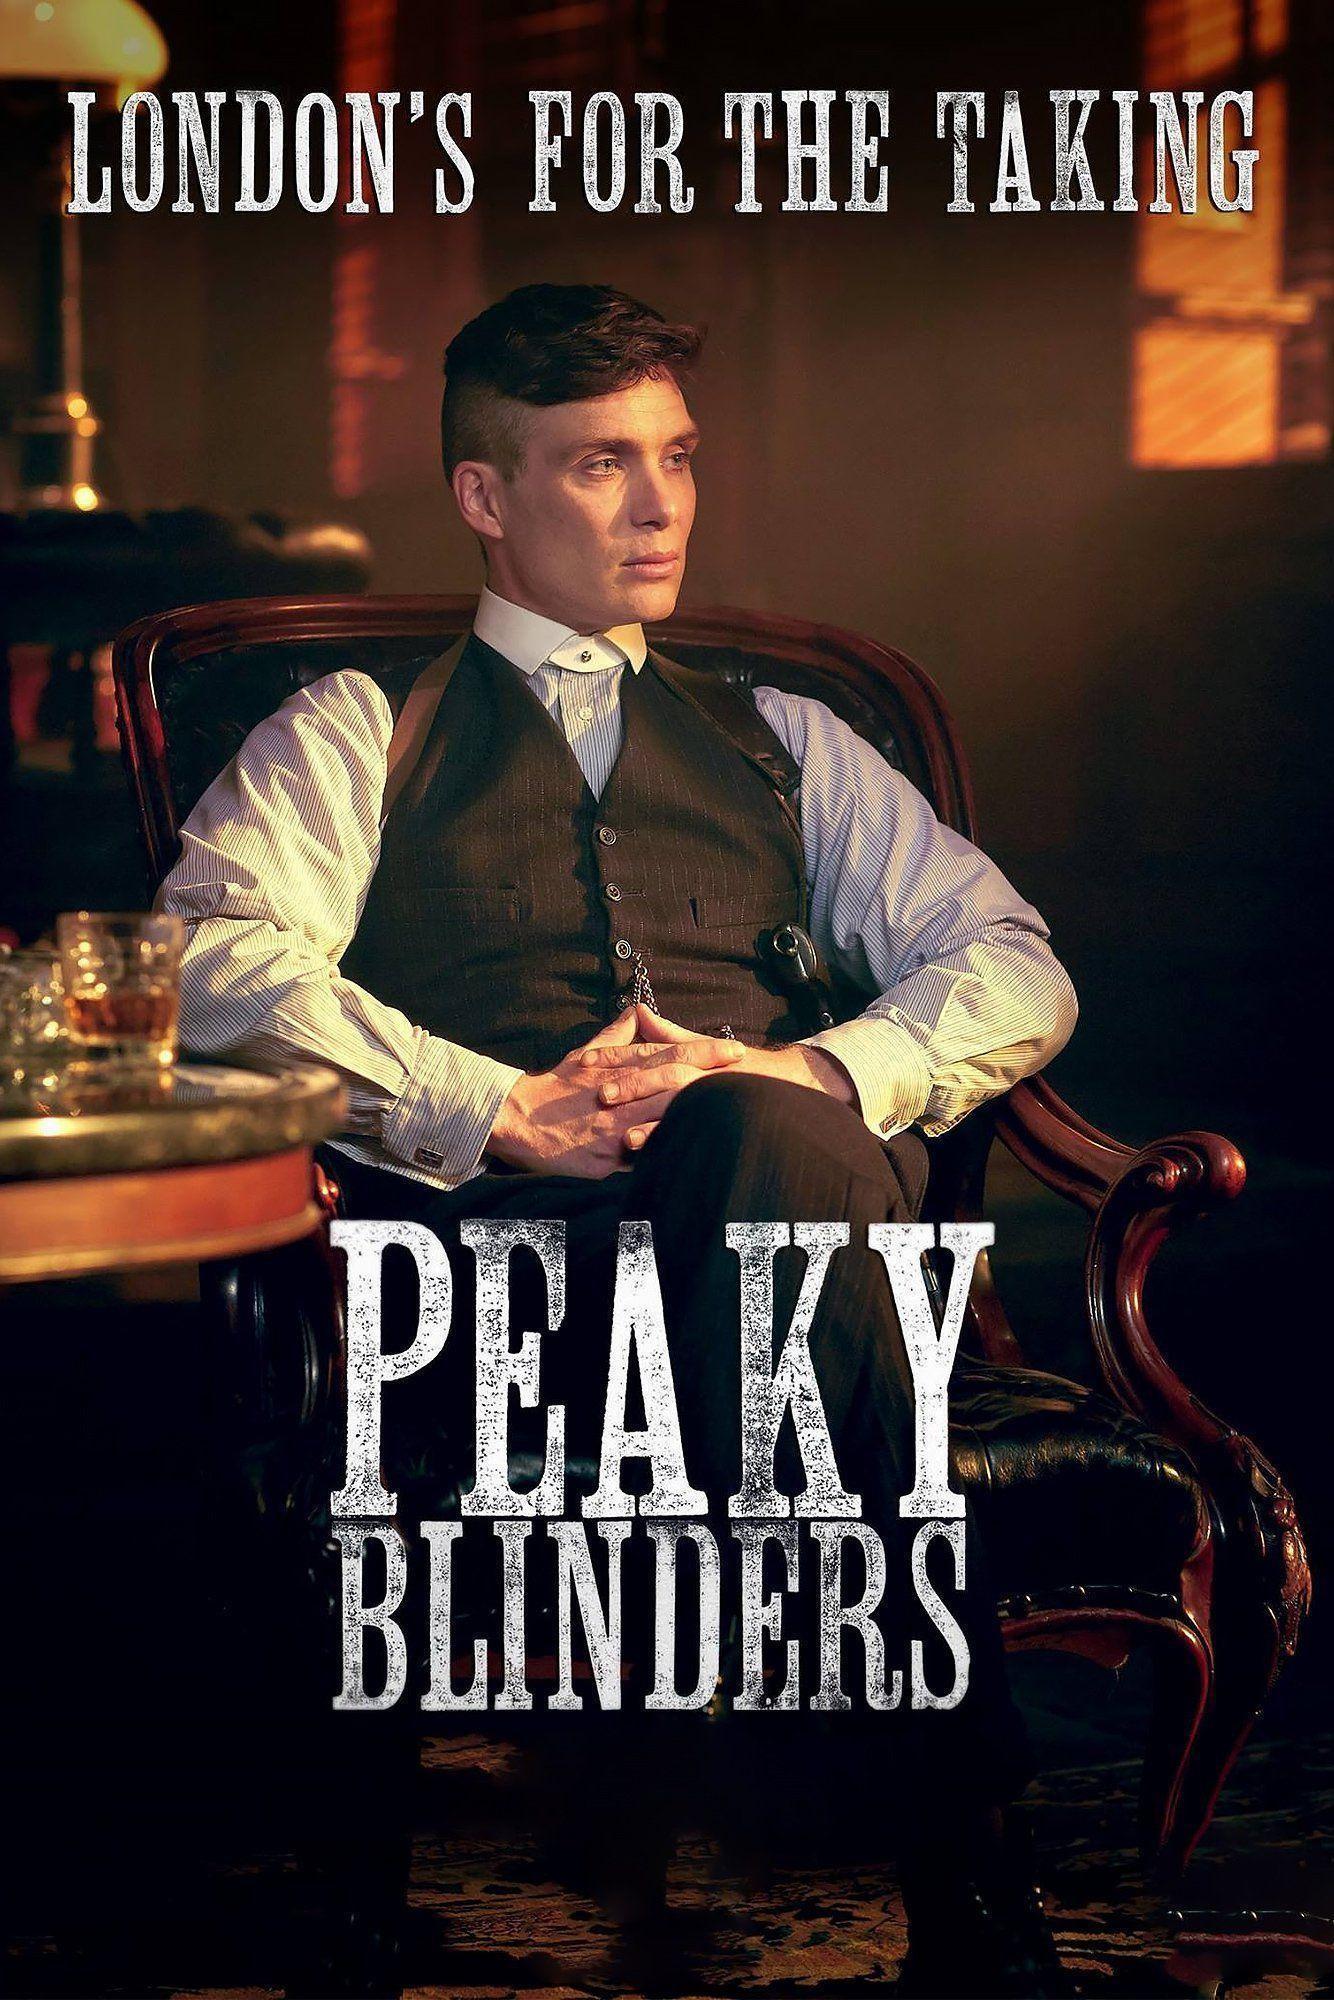 Fondos de pantalla de 'Peaky Blinders'